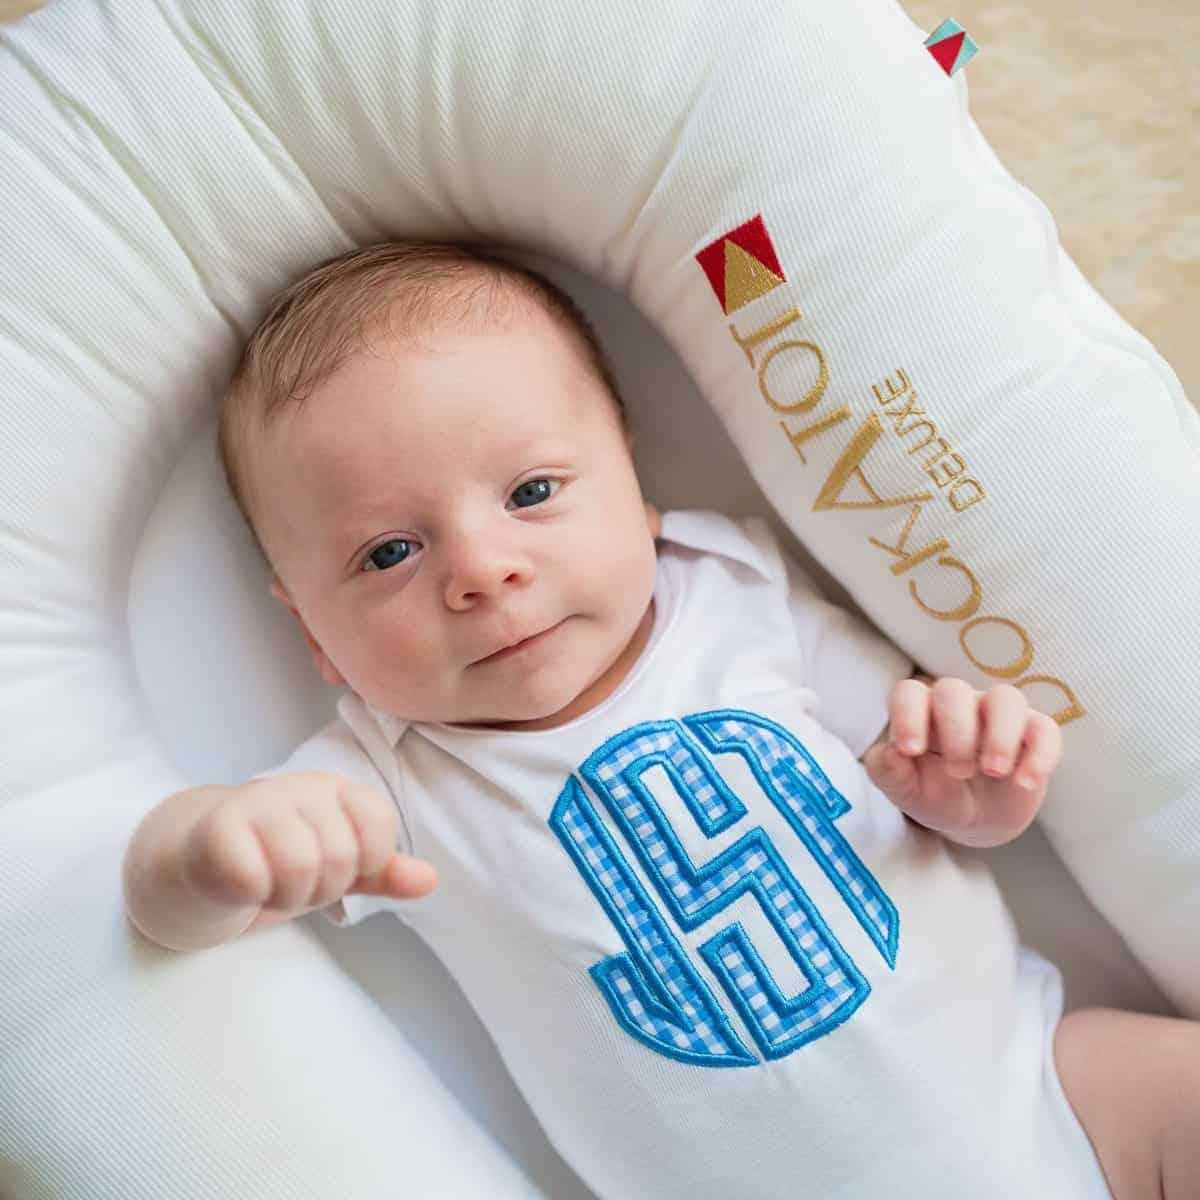 45a8e416cf 25+ Ways to Calm Baby When Mom Needs a Break - Daily Mom